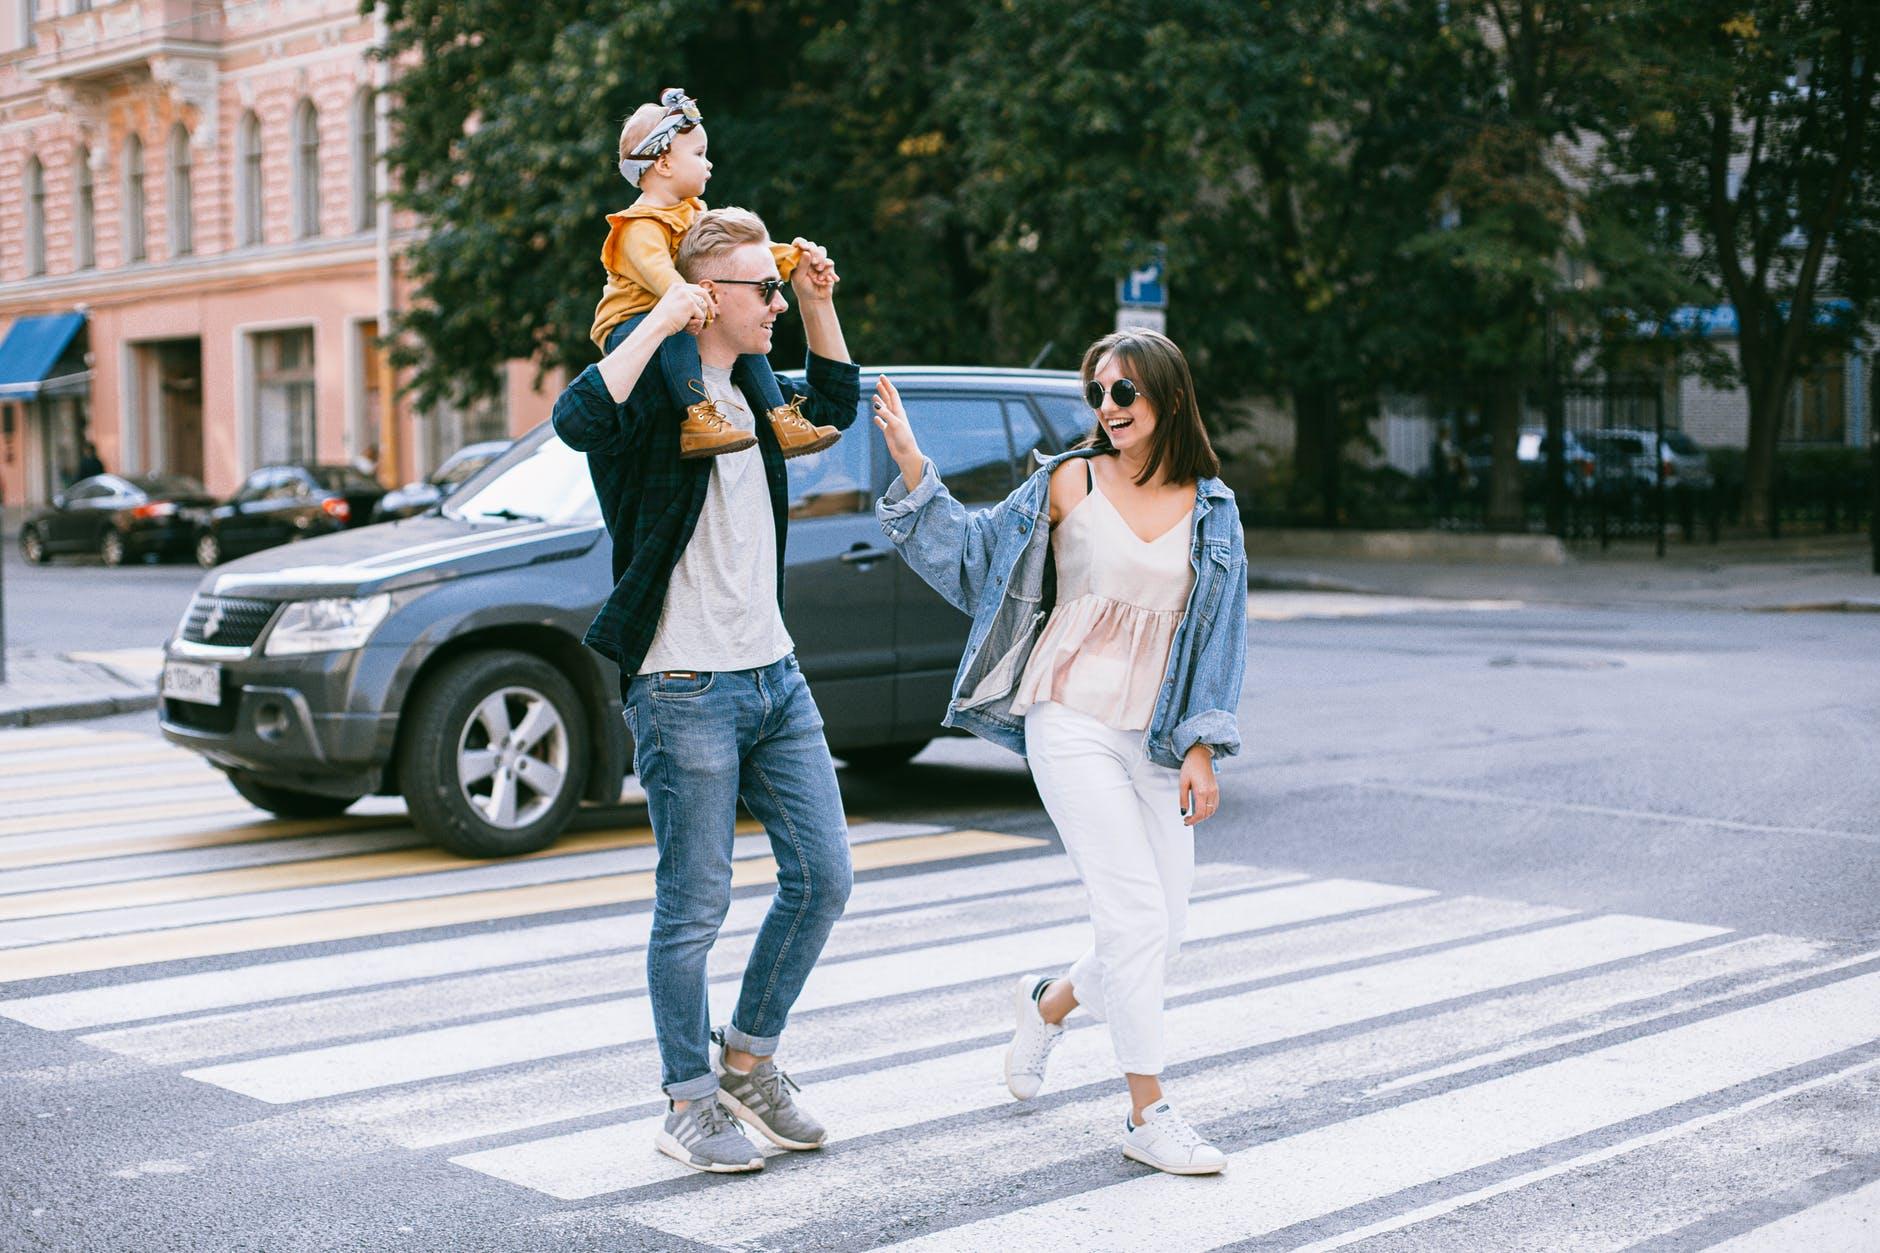 a photo of a family walking in pedestrian lane